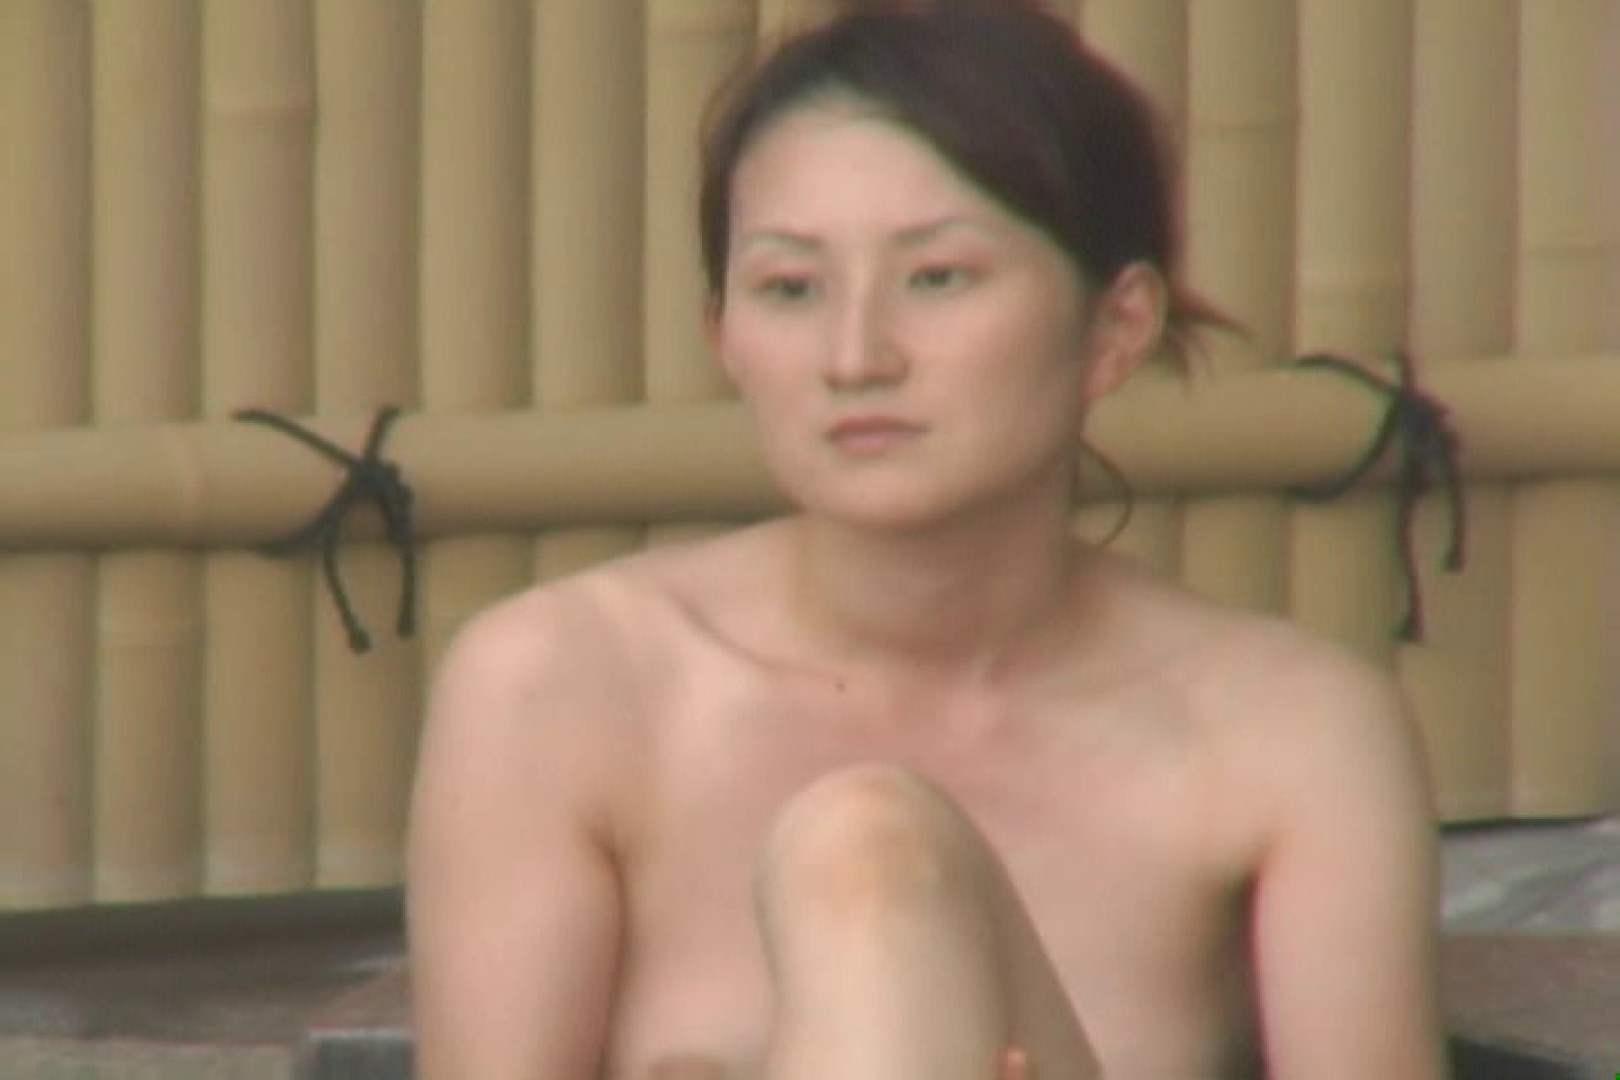 Aquaな露天風呂Vol.578 露天風呂突入 のぞき動画画像 70pic 23